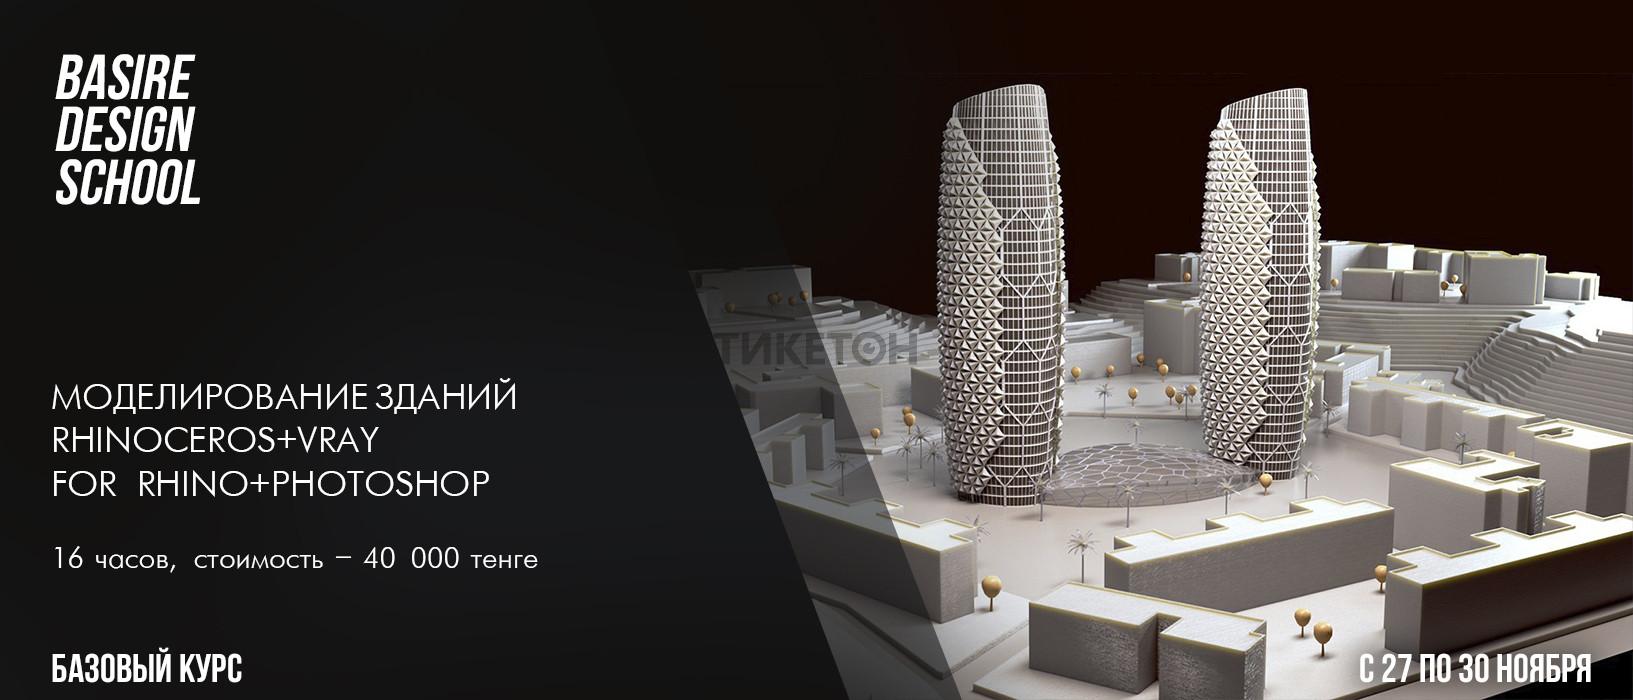 Тренинг «Моделирование зданий Rhinoceros+Vray for Rhino+Photoshop